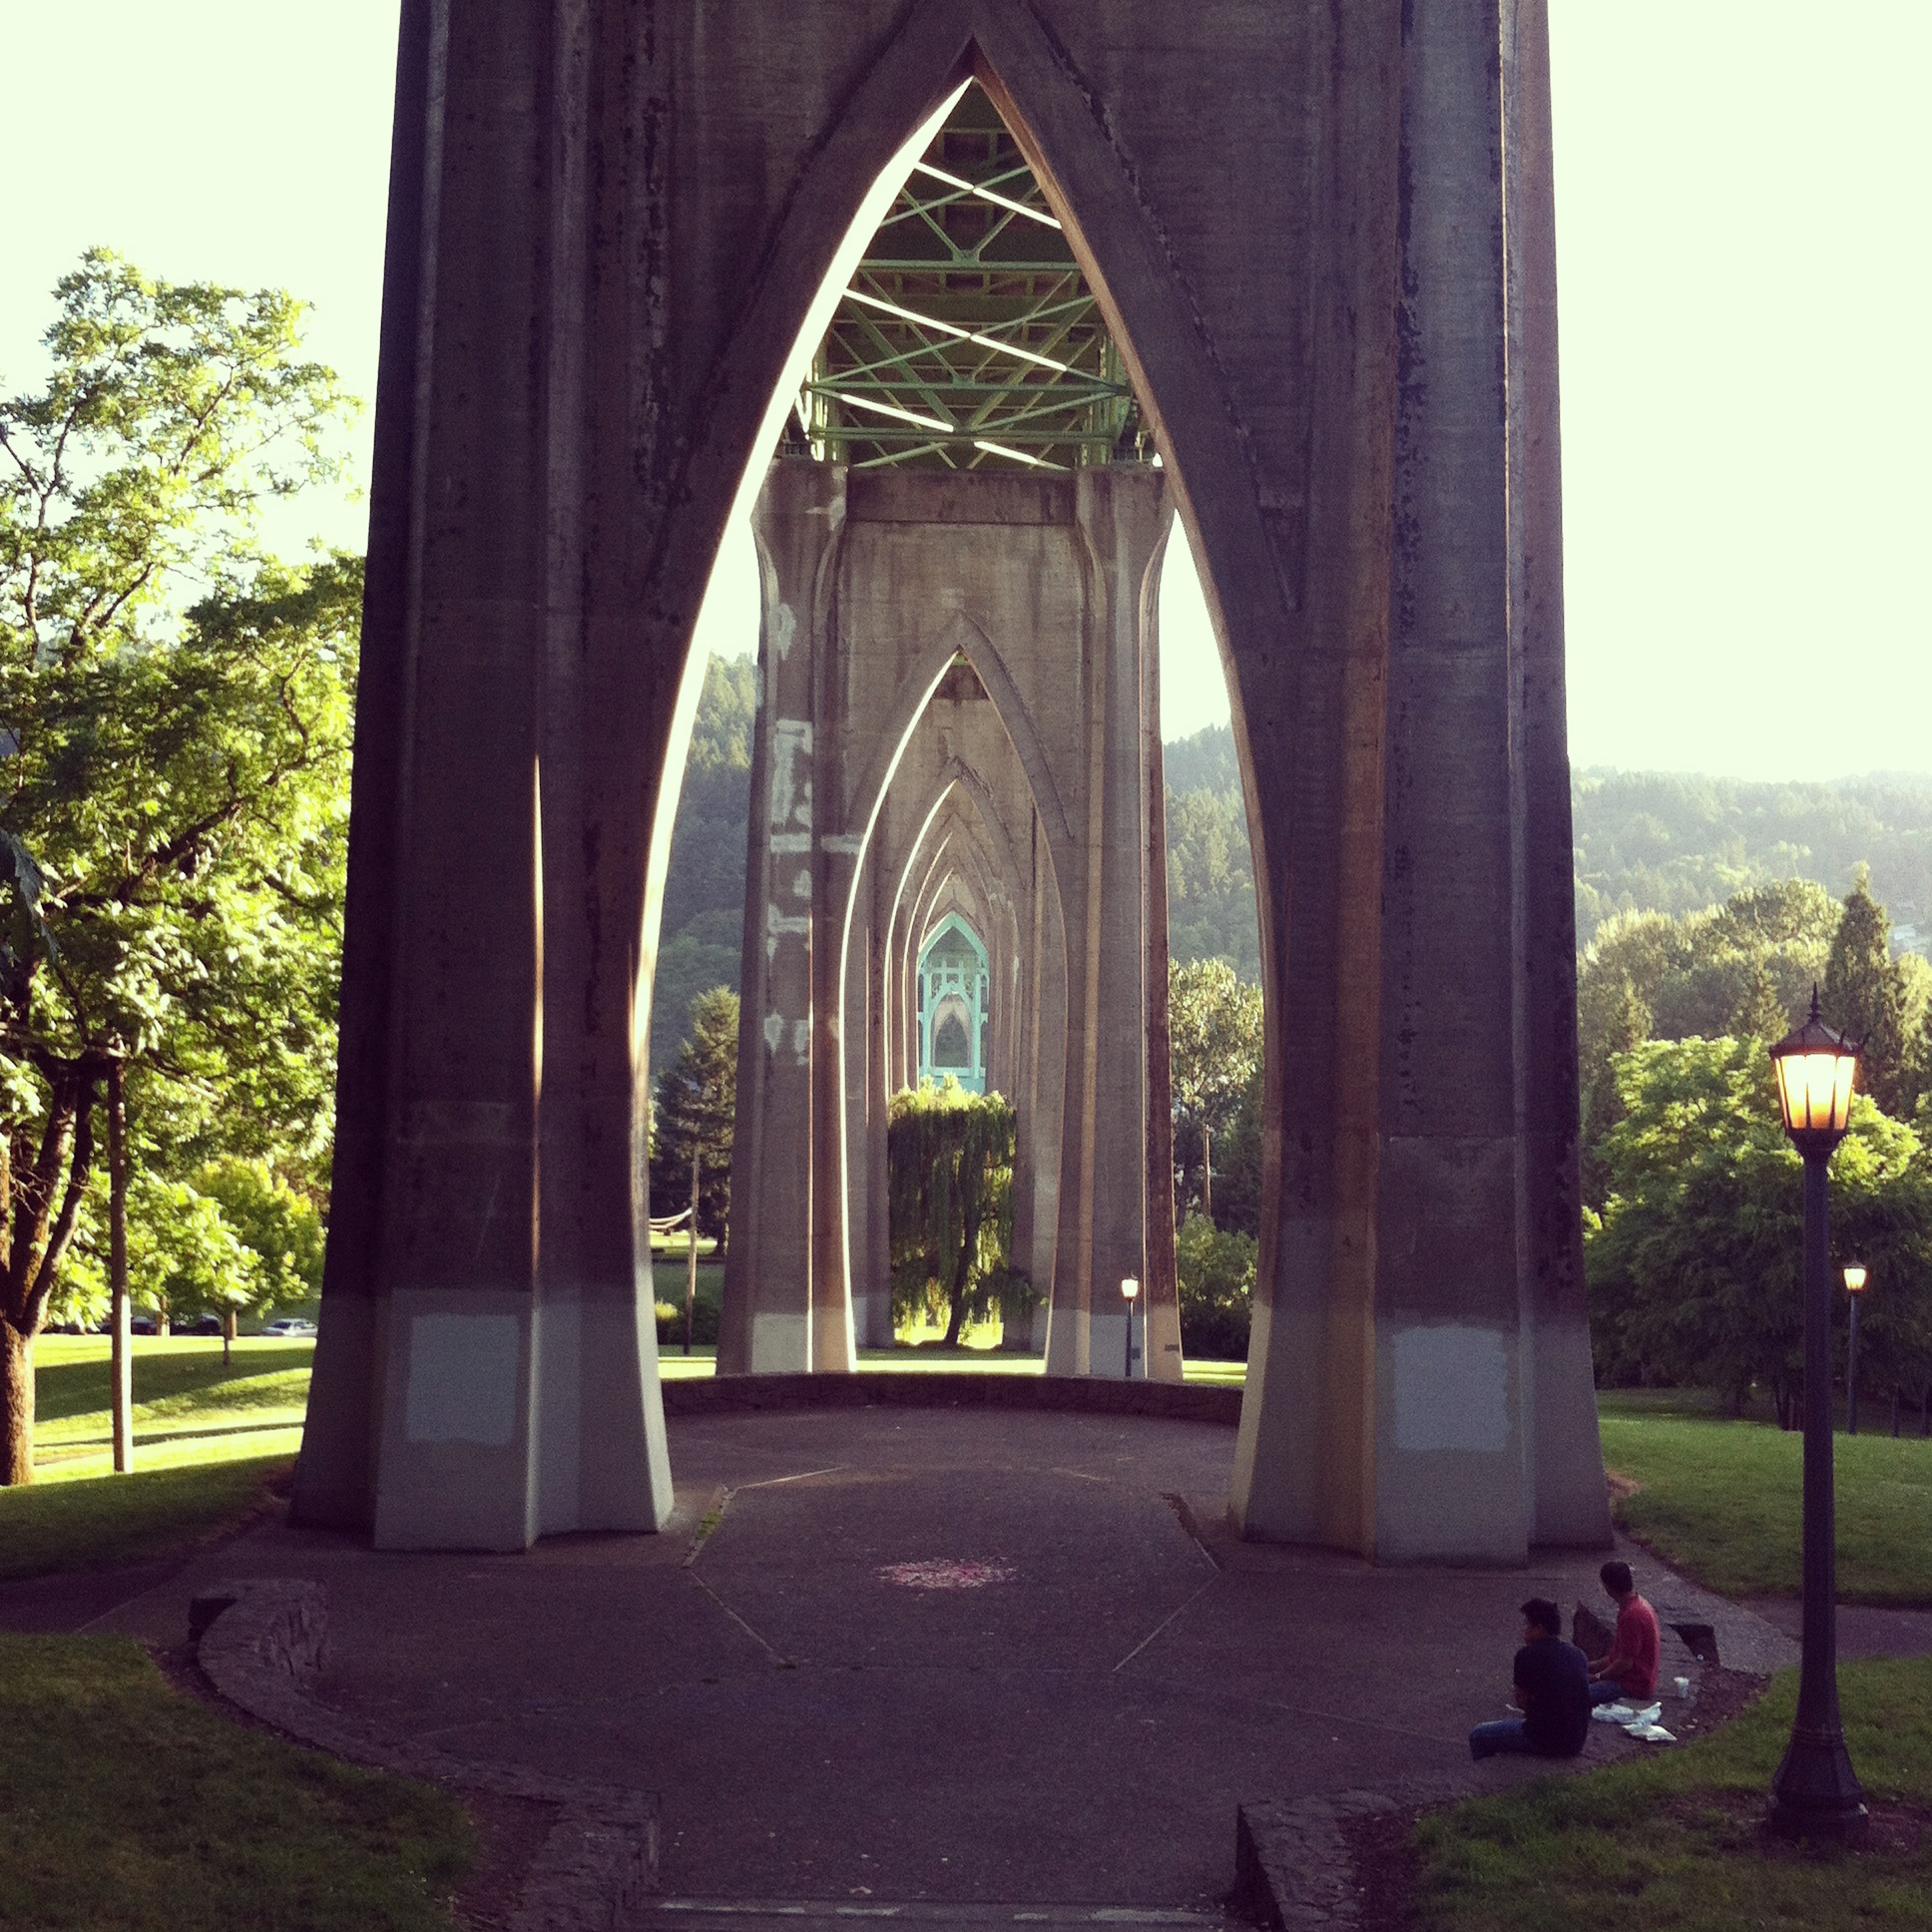 Portland photogallery 17